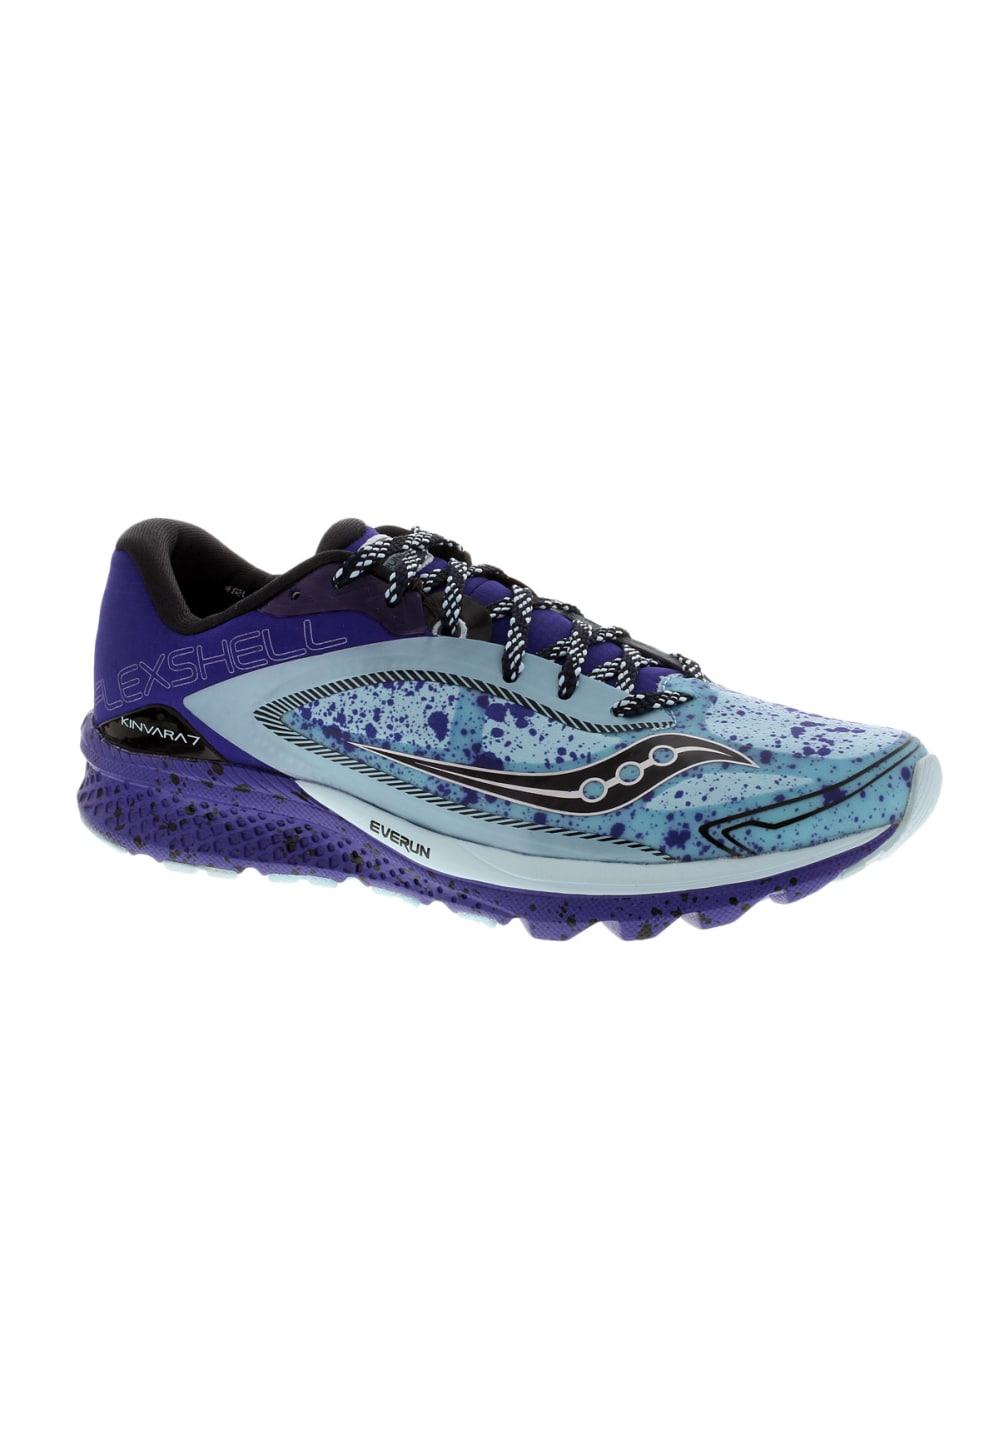 db1b8977cbb0 Next. -60%. Saucony. Kinvara 7 Runshield - Running shoes for Women